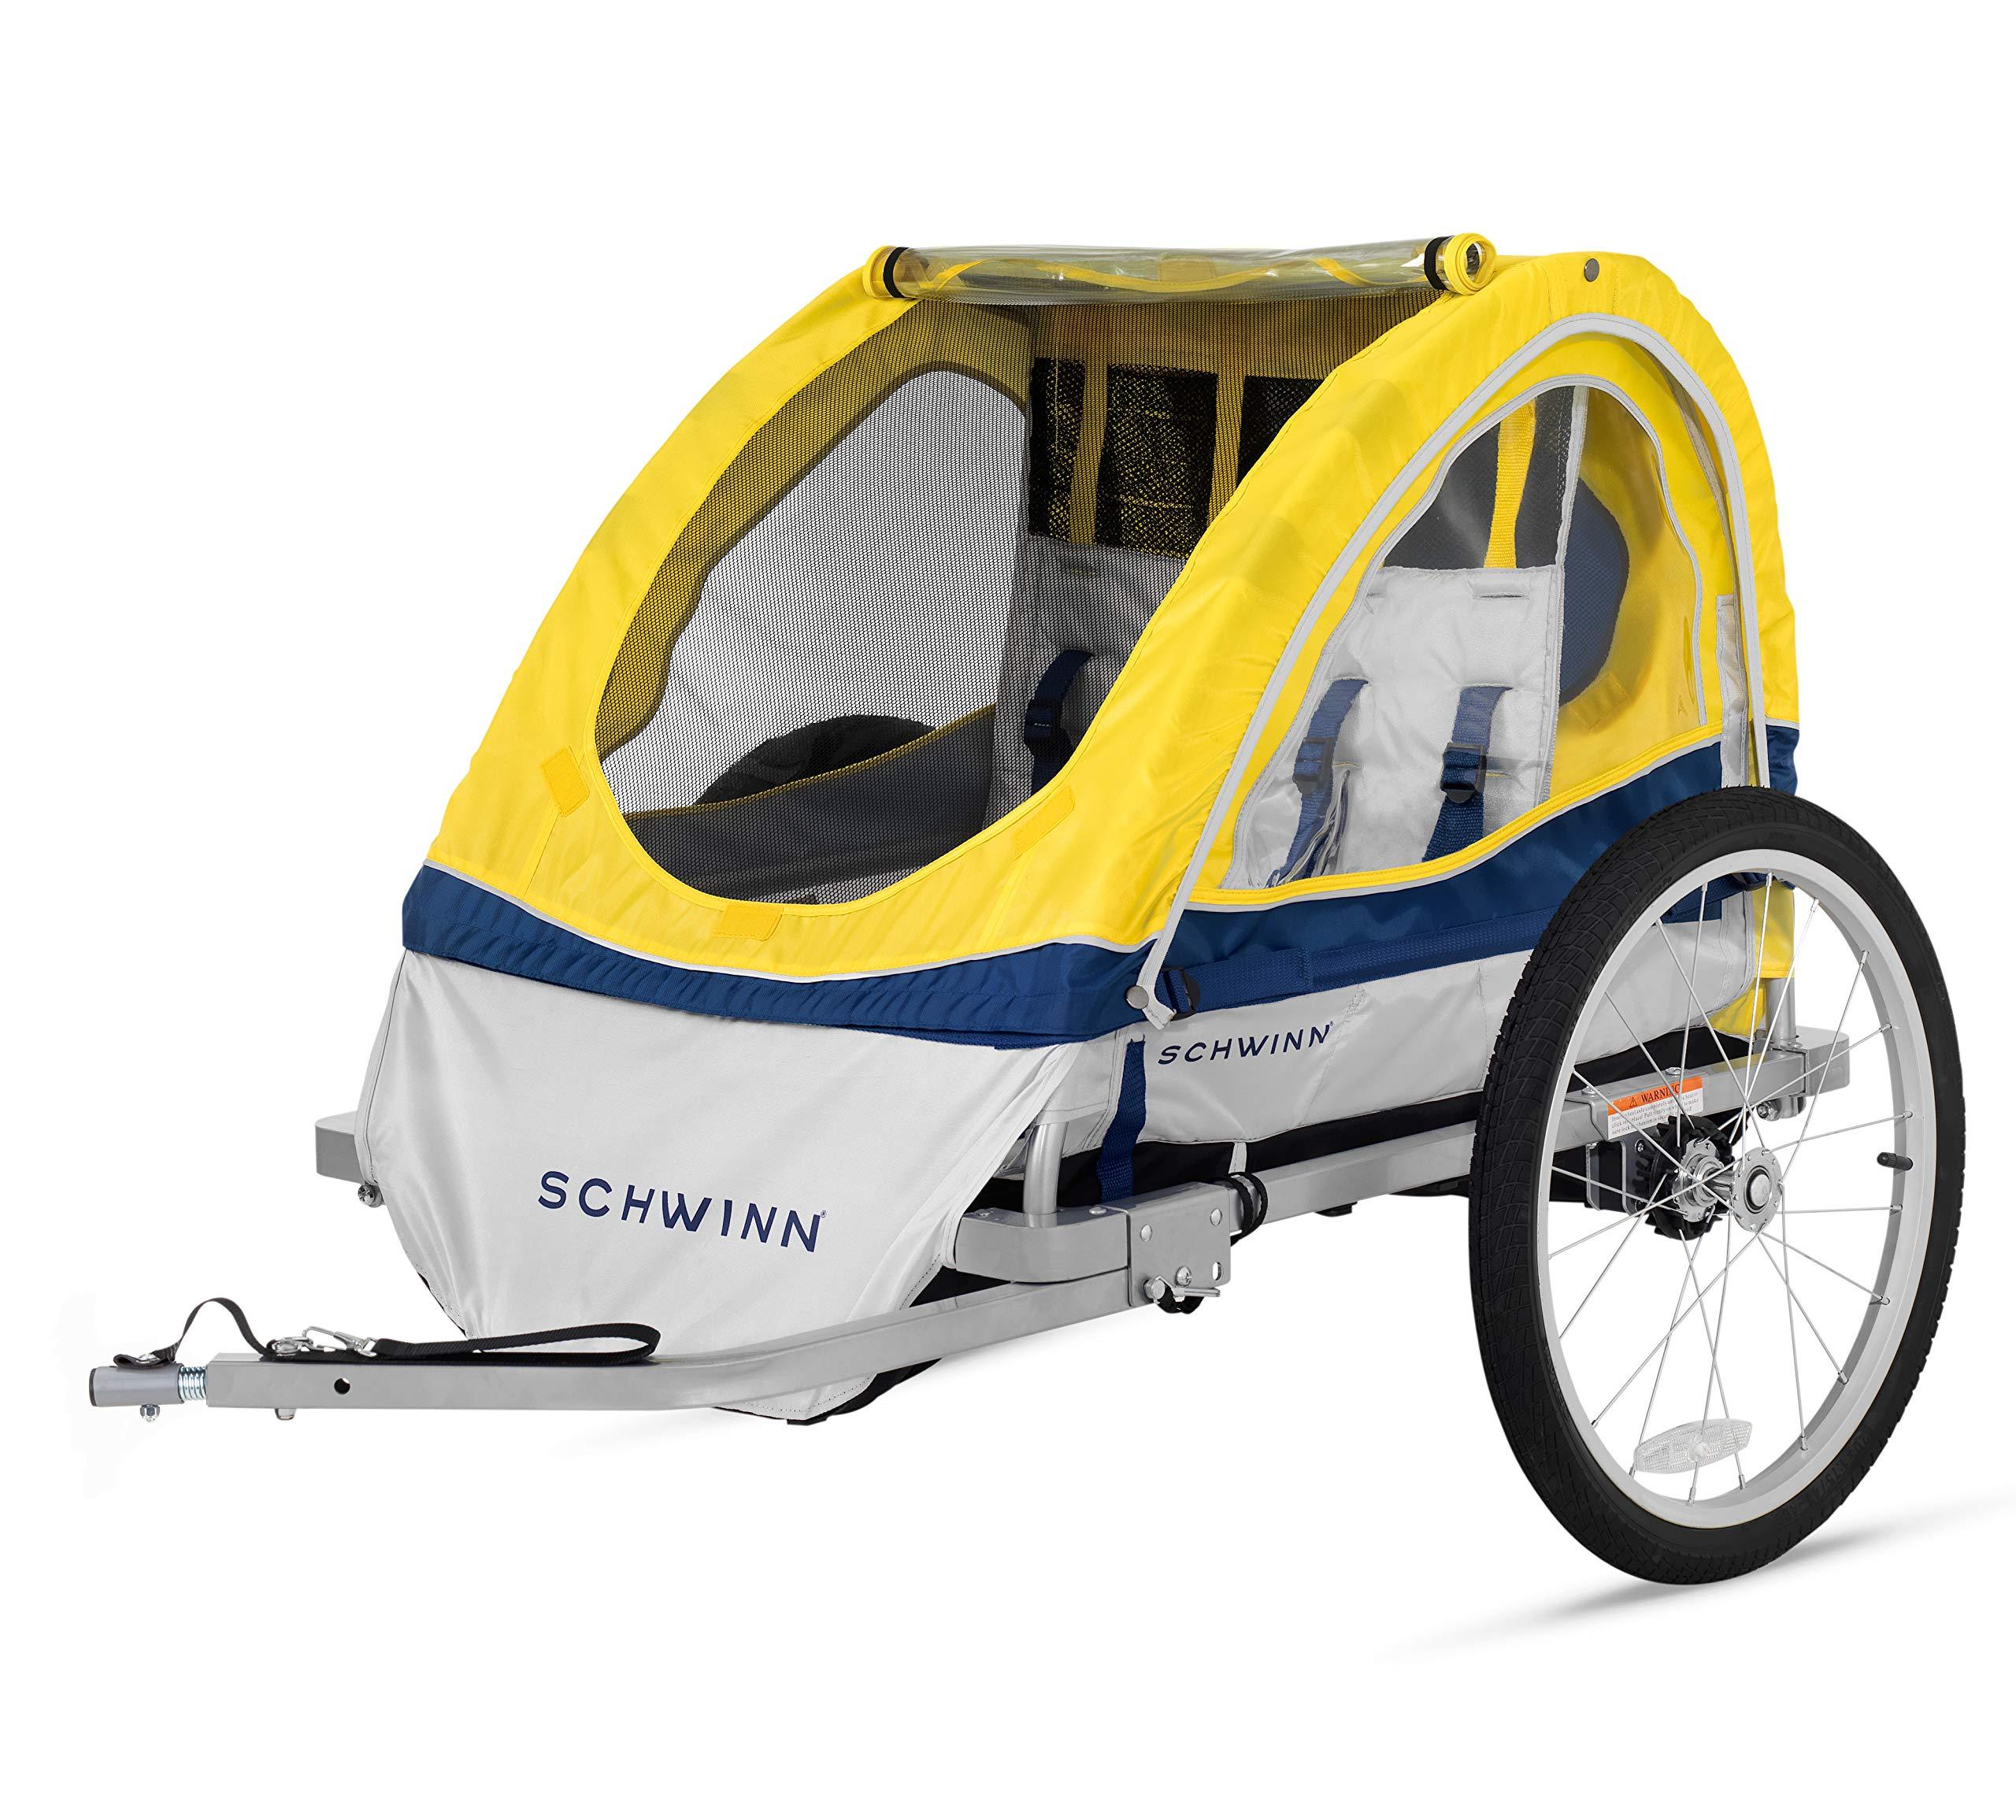 a91e7e01f80 Schwinn Echo Kids/Child Double Tow Behind Bicycle Trailer, 20 inch wheel  size, foldable, yellow. By Schwinn